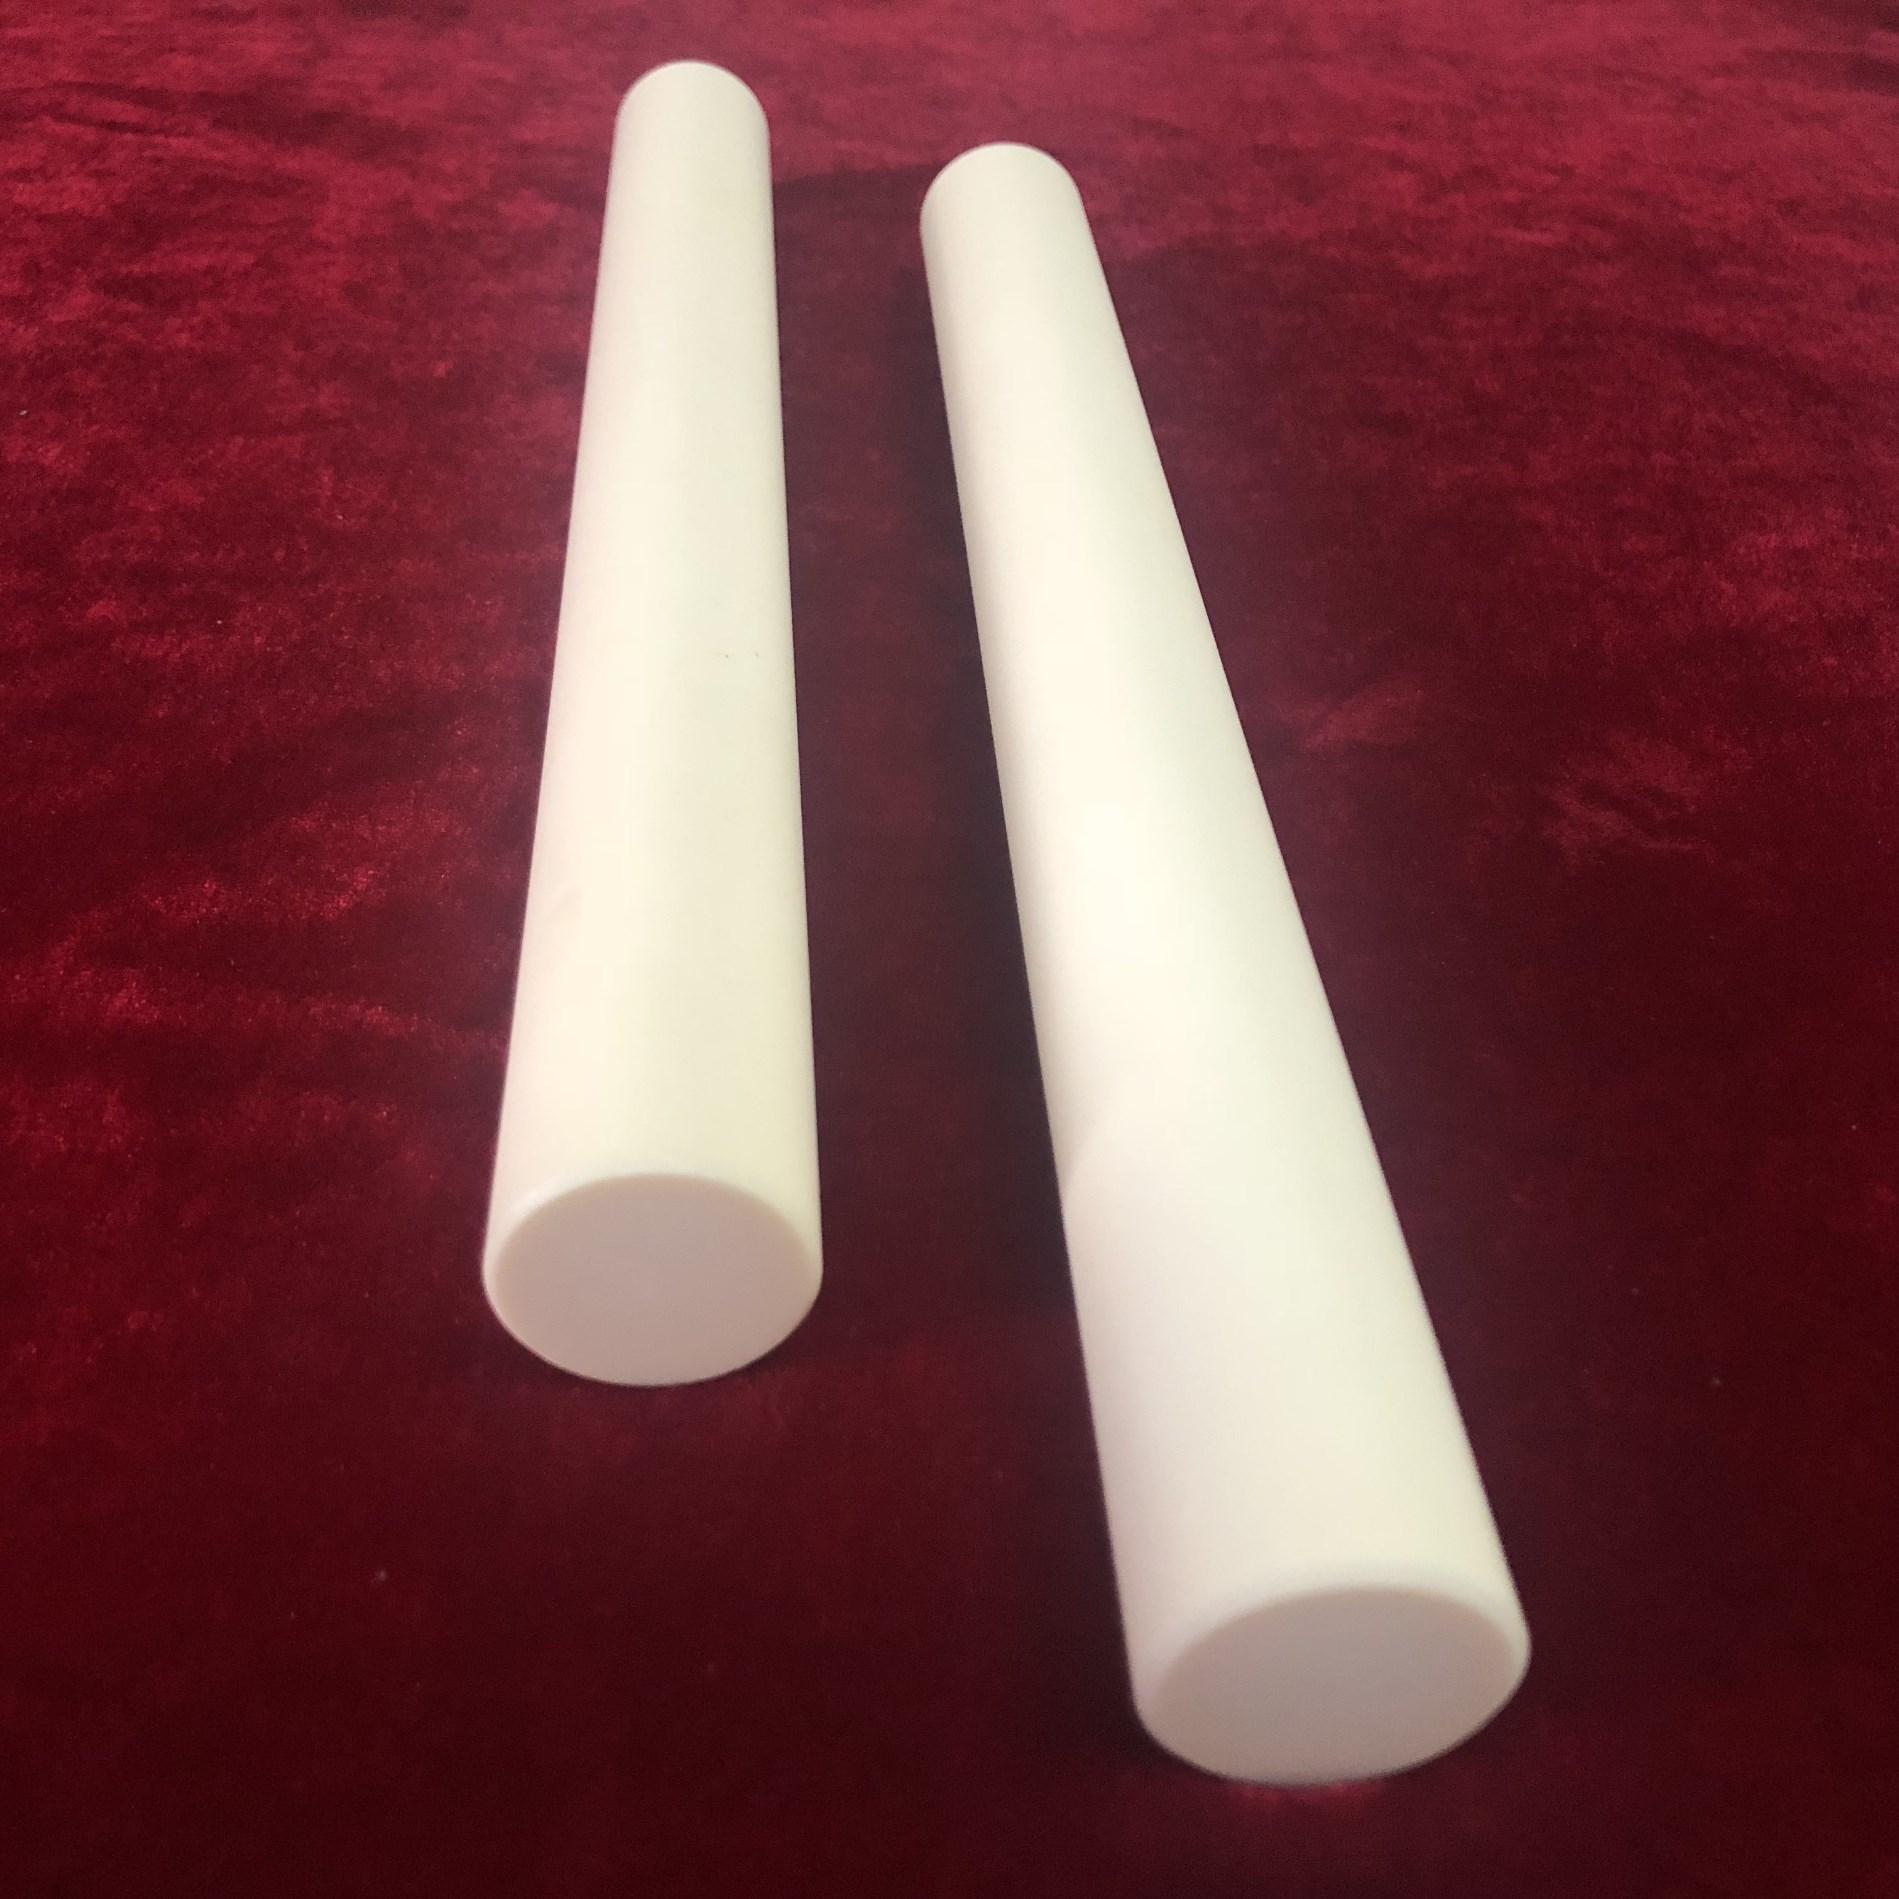 Kaufen 99,3% Aluminiumoxid Keramik Solid Bar;99,3% Aluminiumoxid Keramik Solid Bar Preis;99,3% Aluminiumoxid Keramik Solid Bar Marken;99,3% Aluminiumoxid Keramik Solid Bar Hersteller;99,3% Aluminiumoxid Keramik Solid Bar Zitat;99,3% Aluminiumoxid Keramik Solid Bar Unternehmen